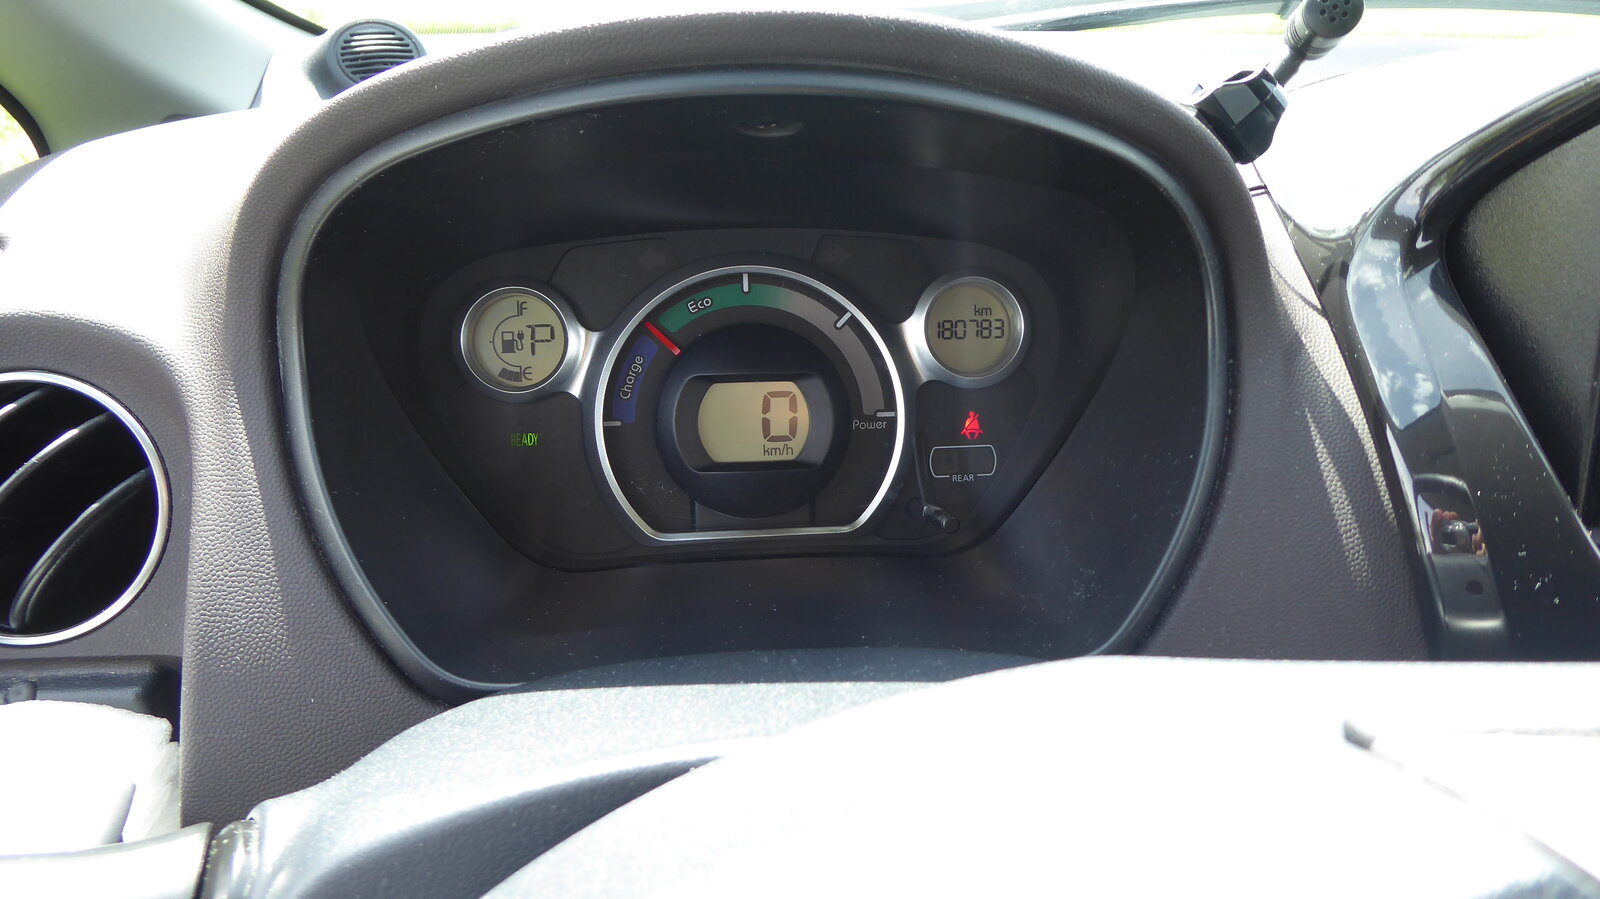 cockpit-jpg.9225